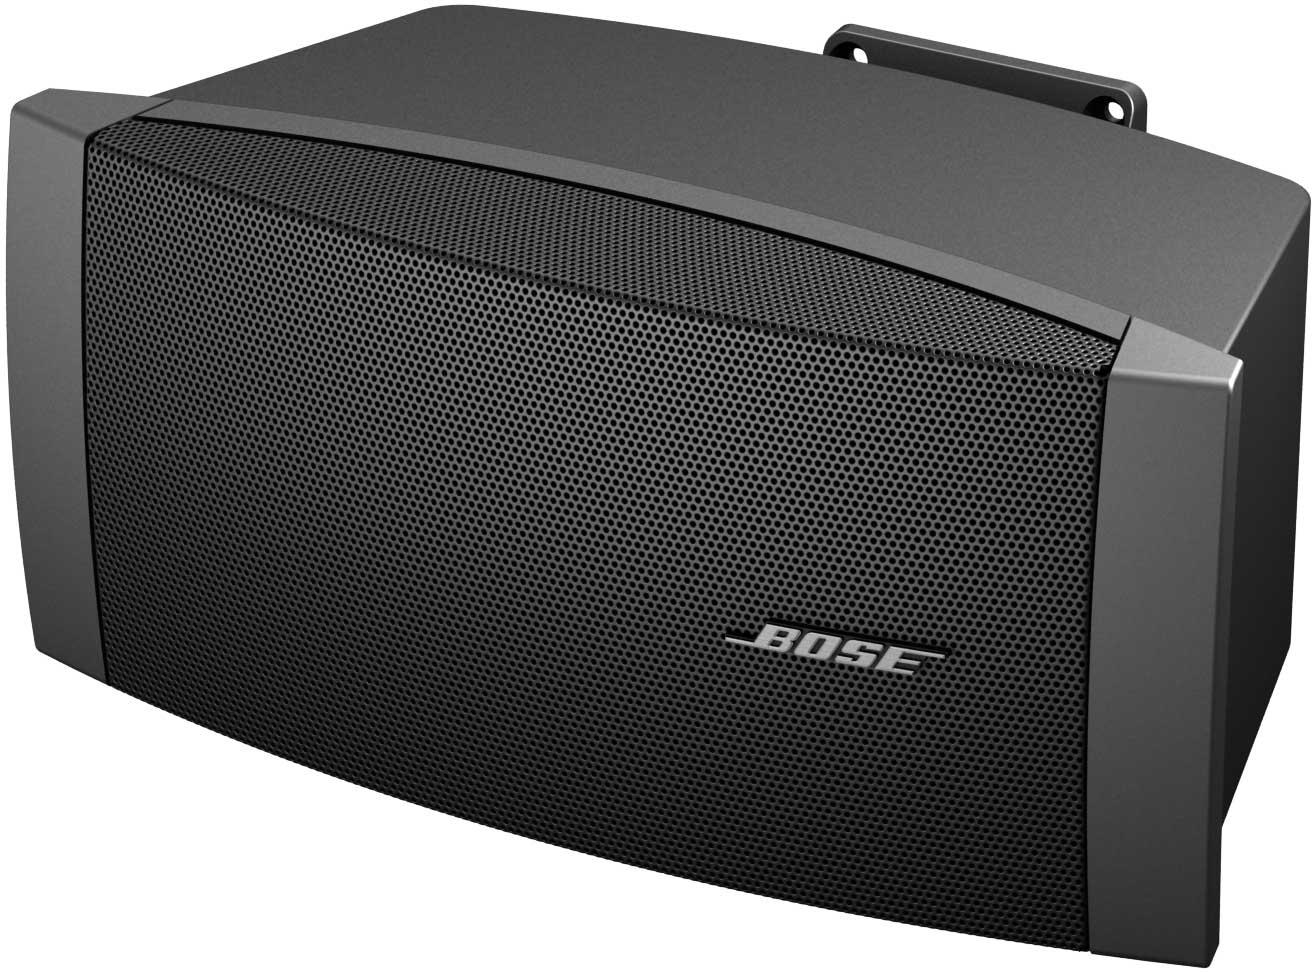 "FreeSpace Indoor/Outdoor Commercial Loudspeaker, Multi-Tap Transformer, 5.25"", 100W @ 8 Ohms, Black"